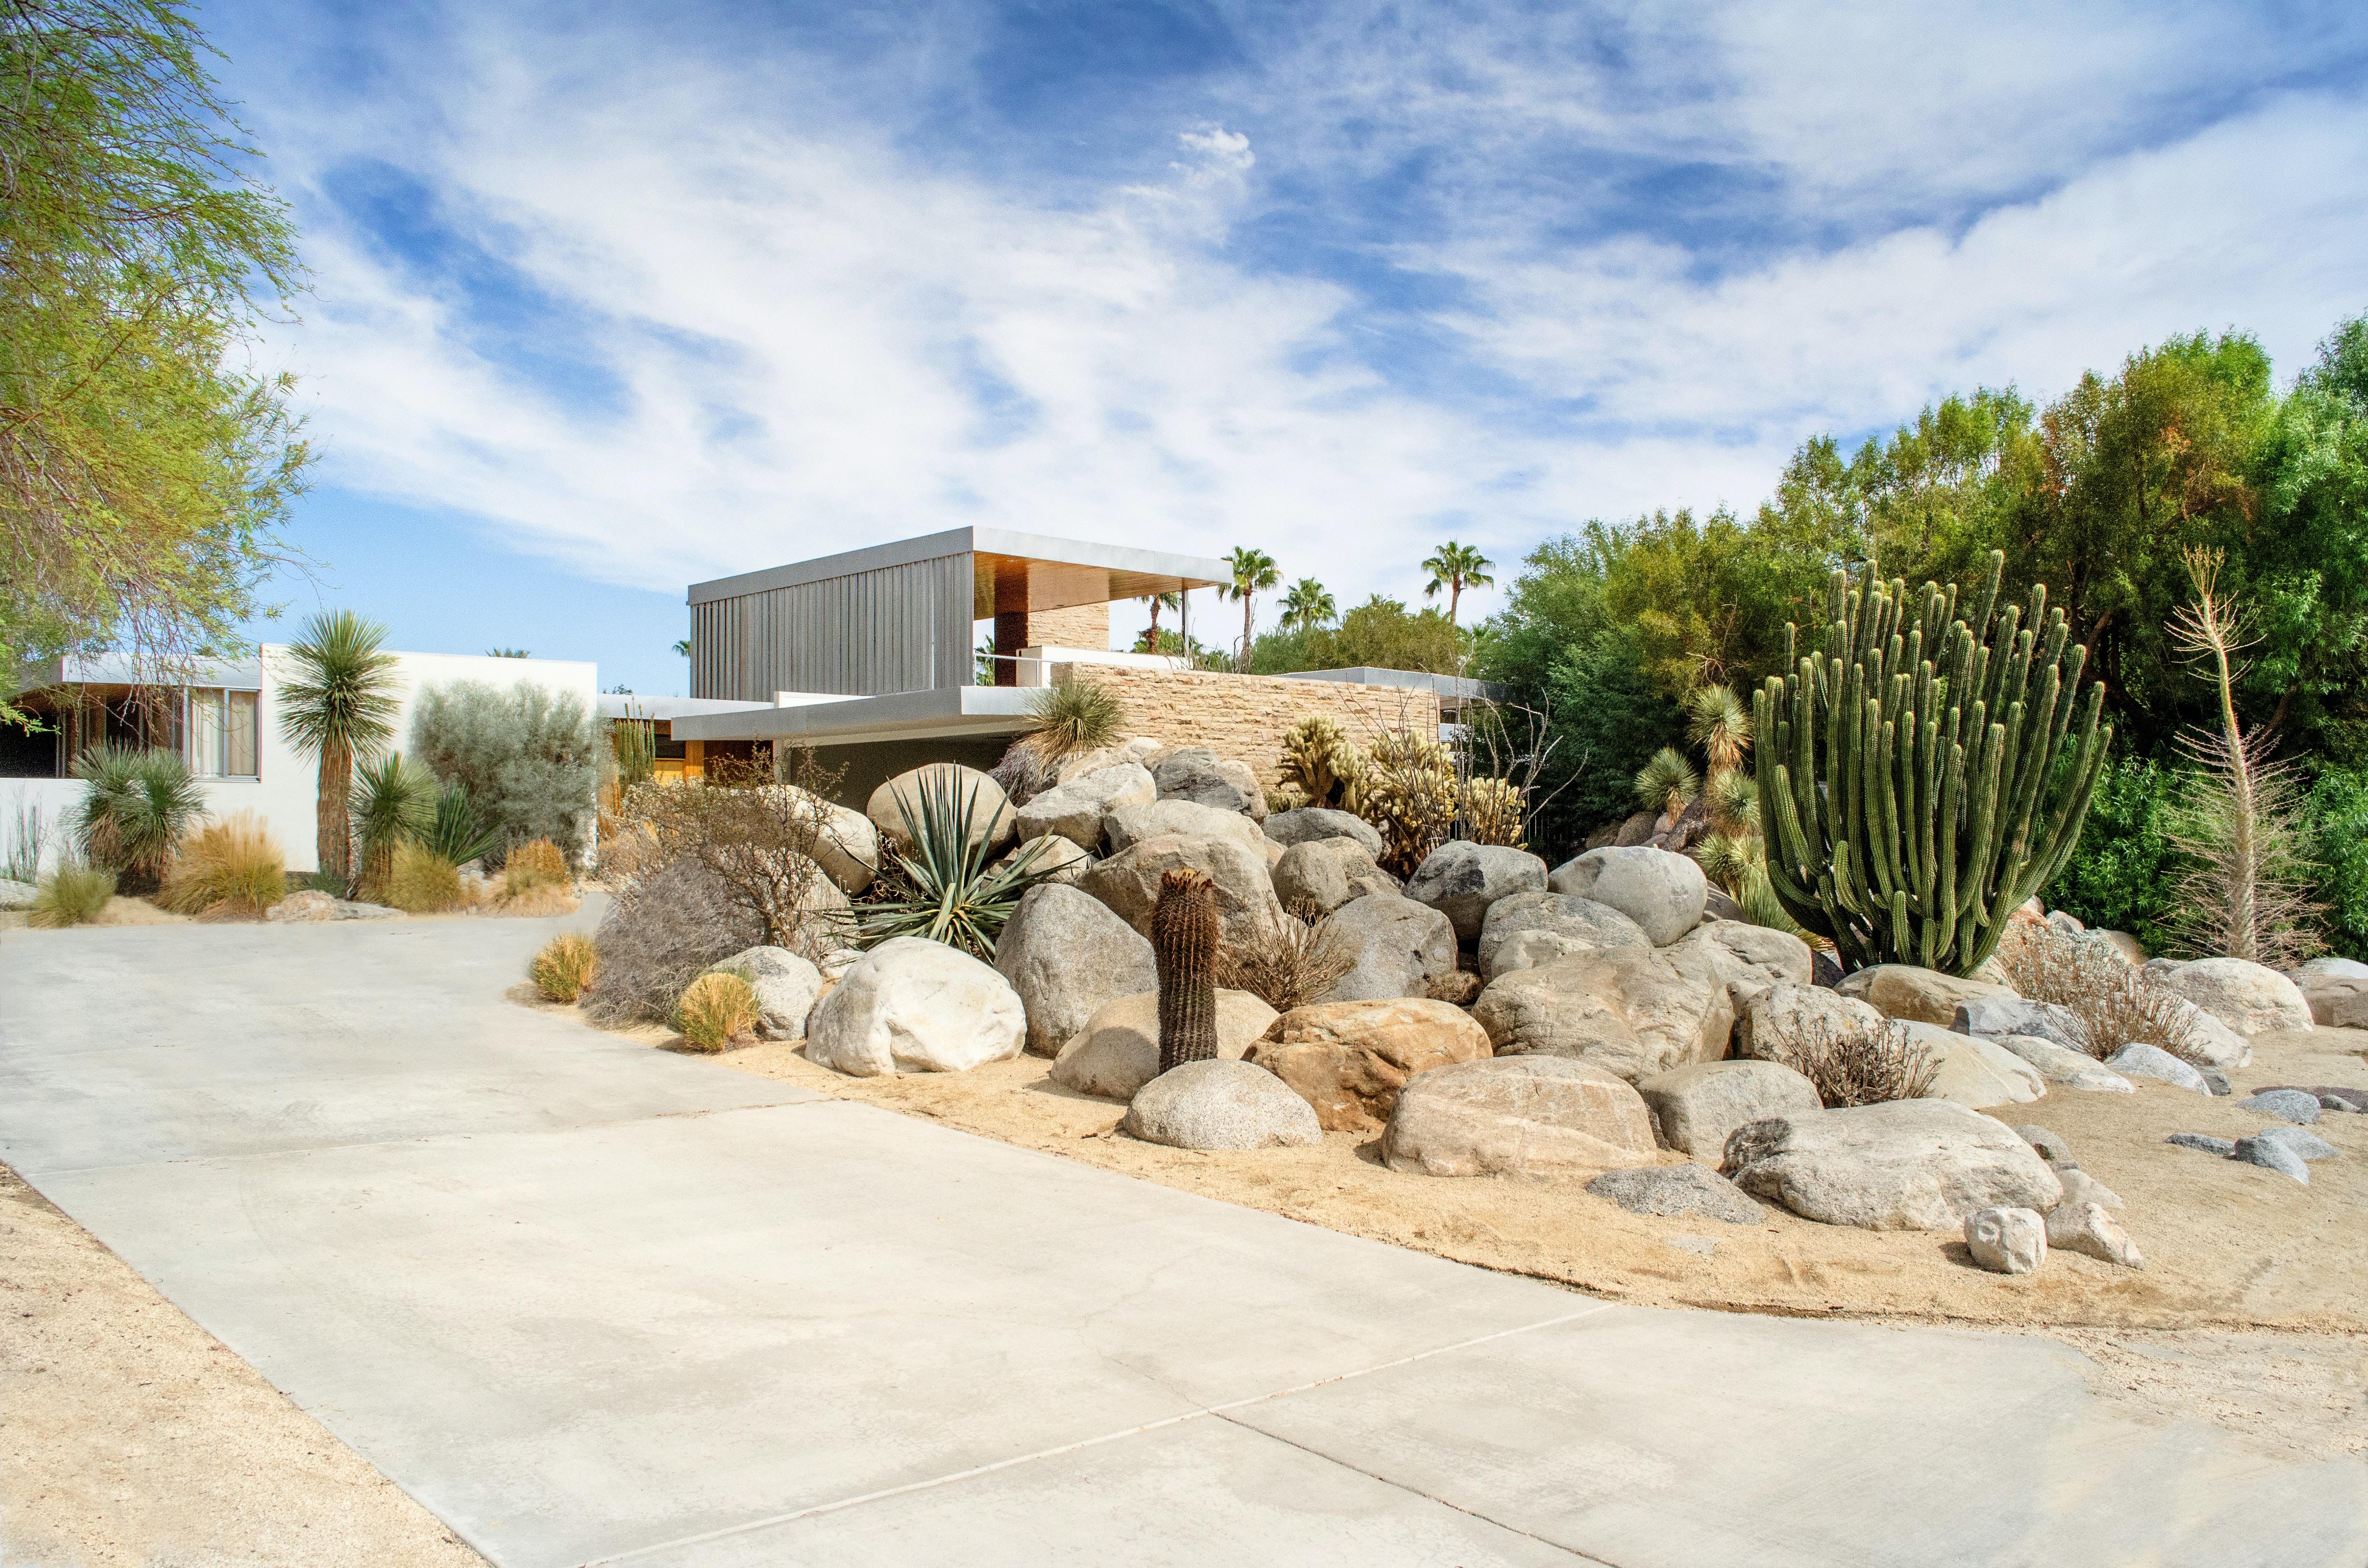 cacti beside rocks